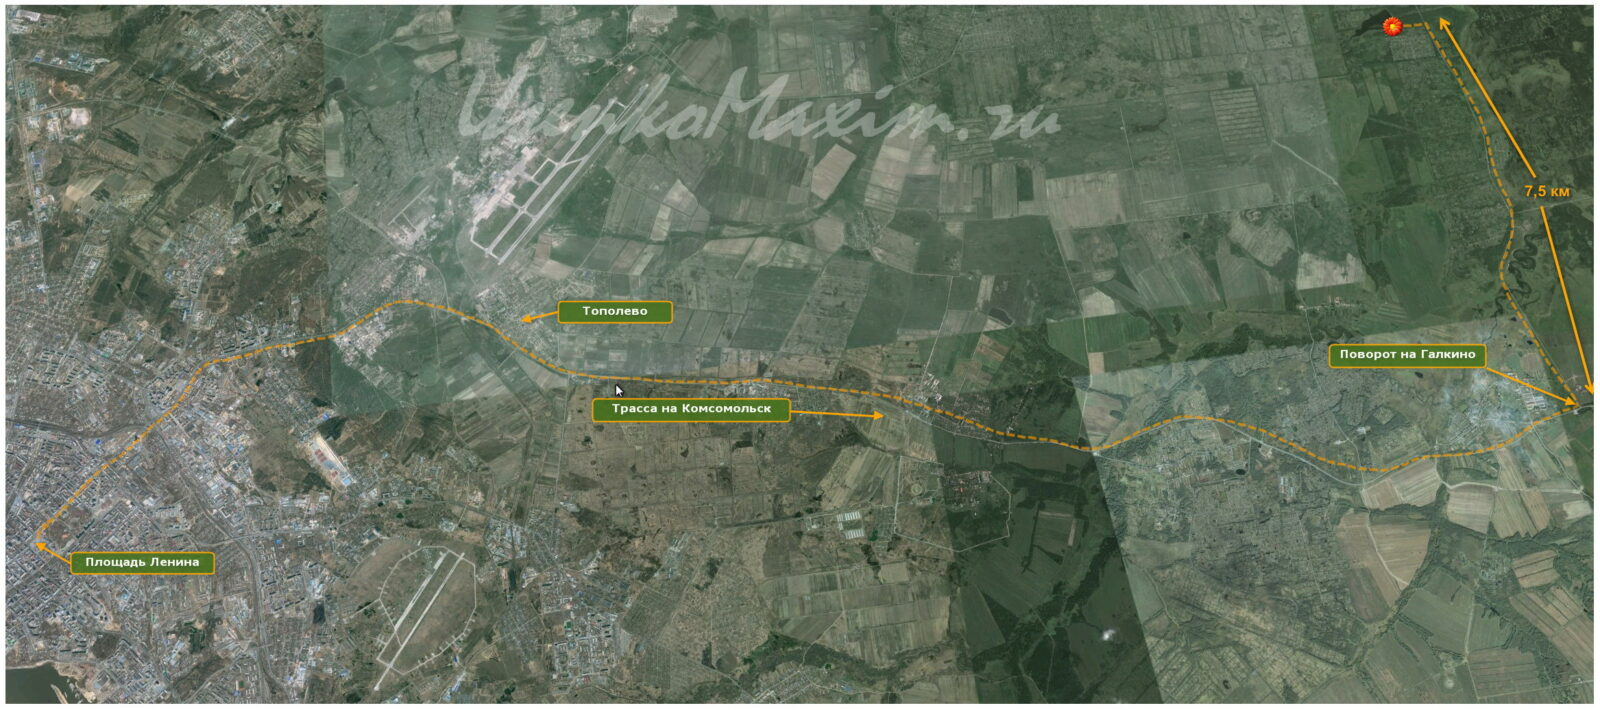 Схема проезда к озеру лотосов. От площади Ленина почти до Галкино